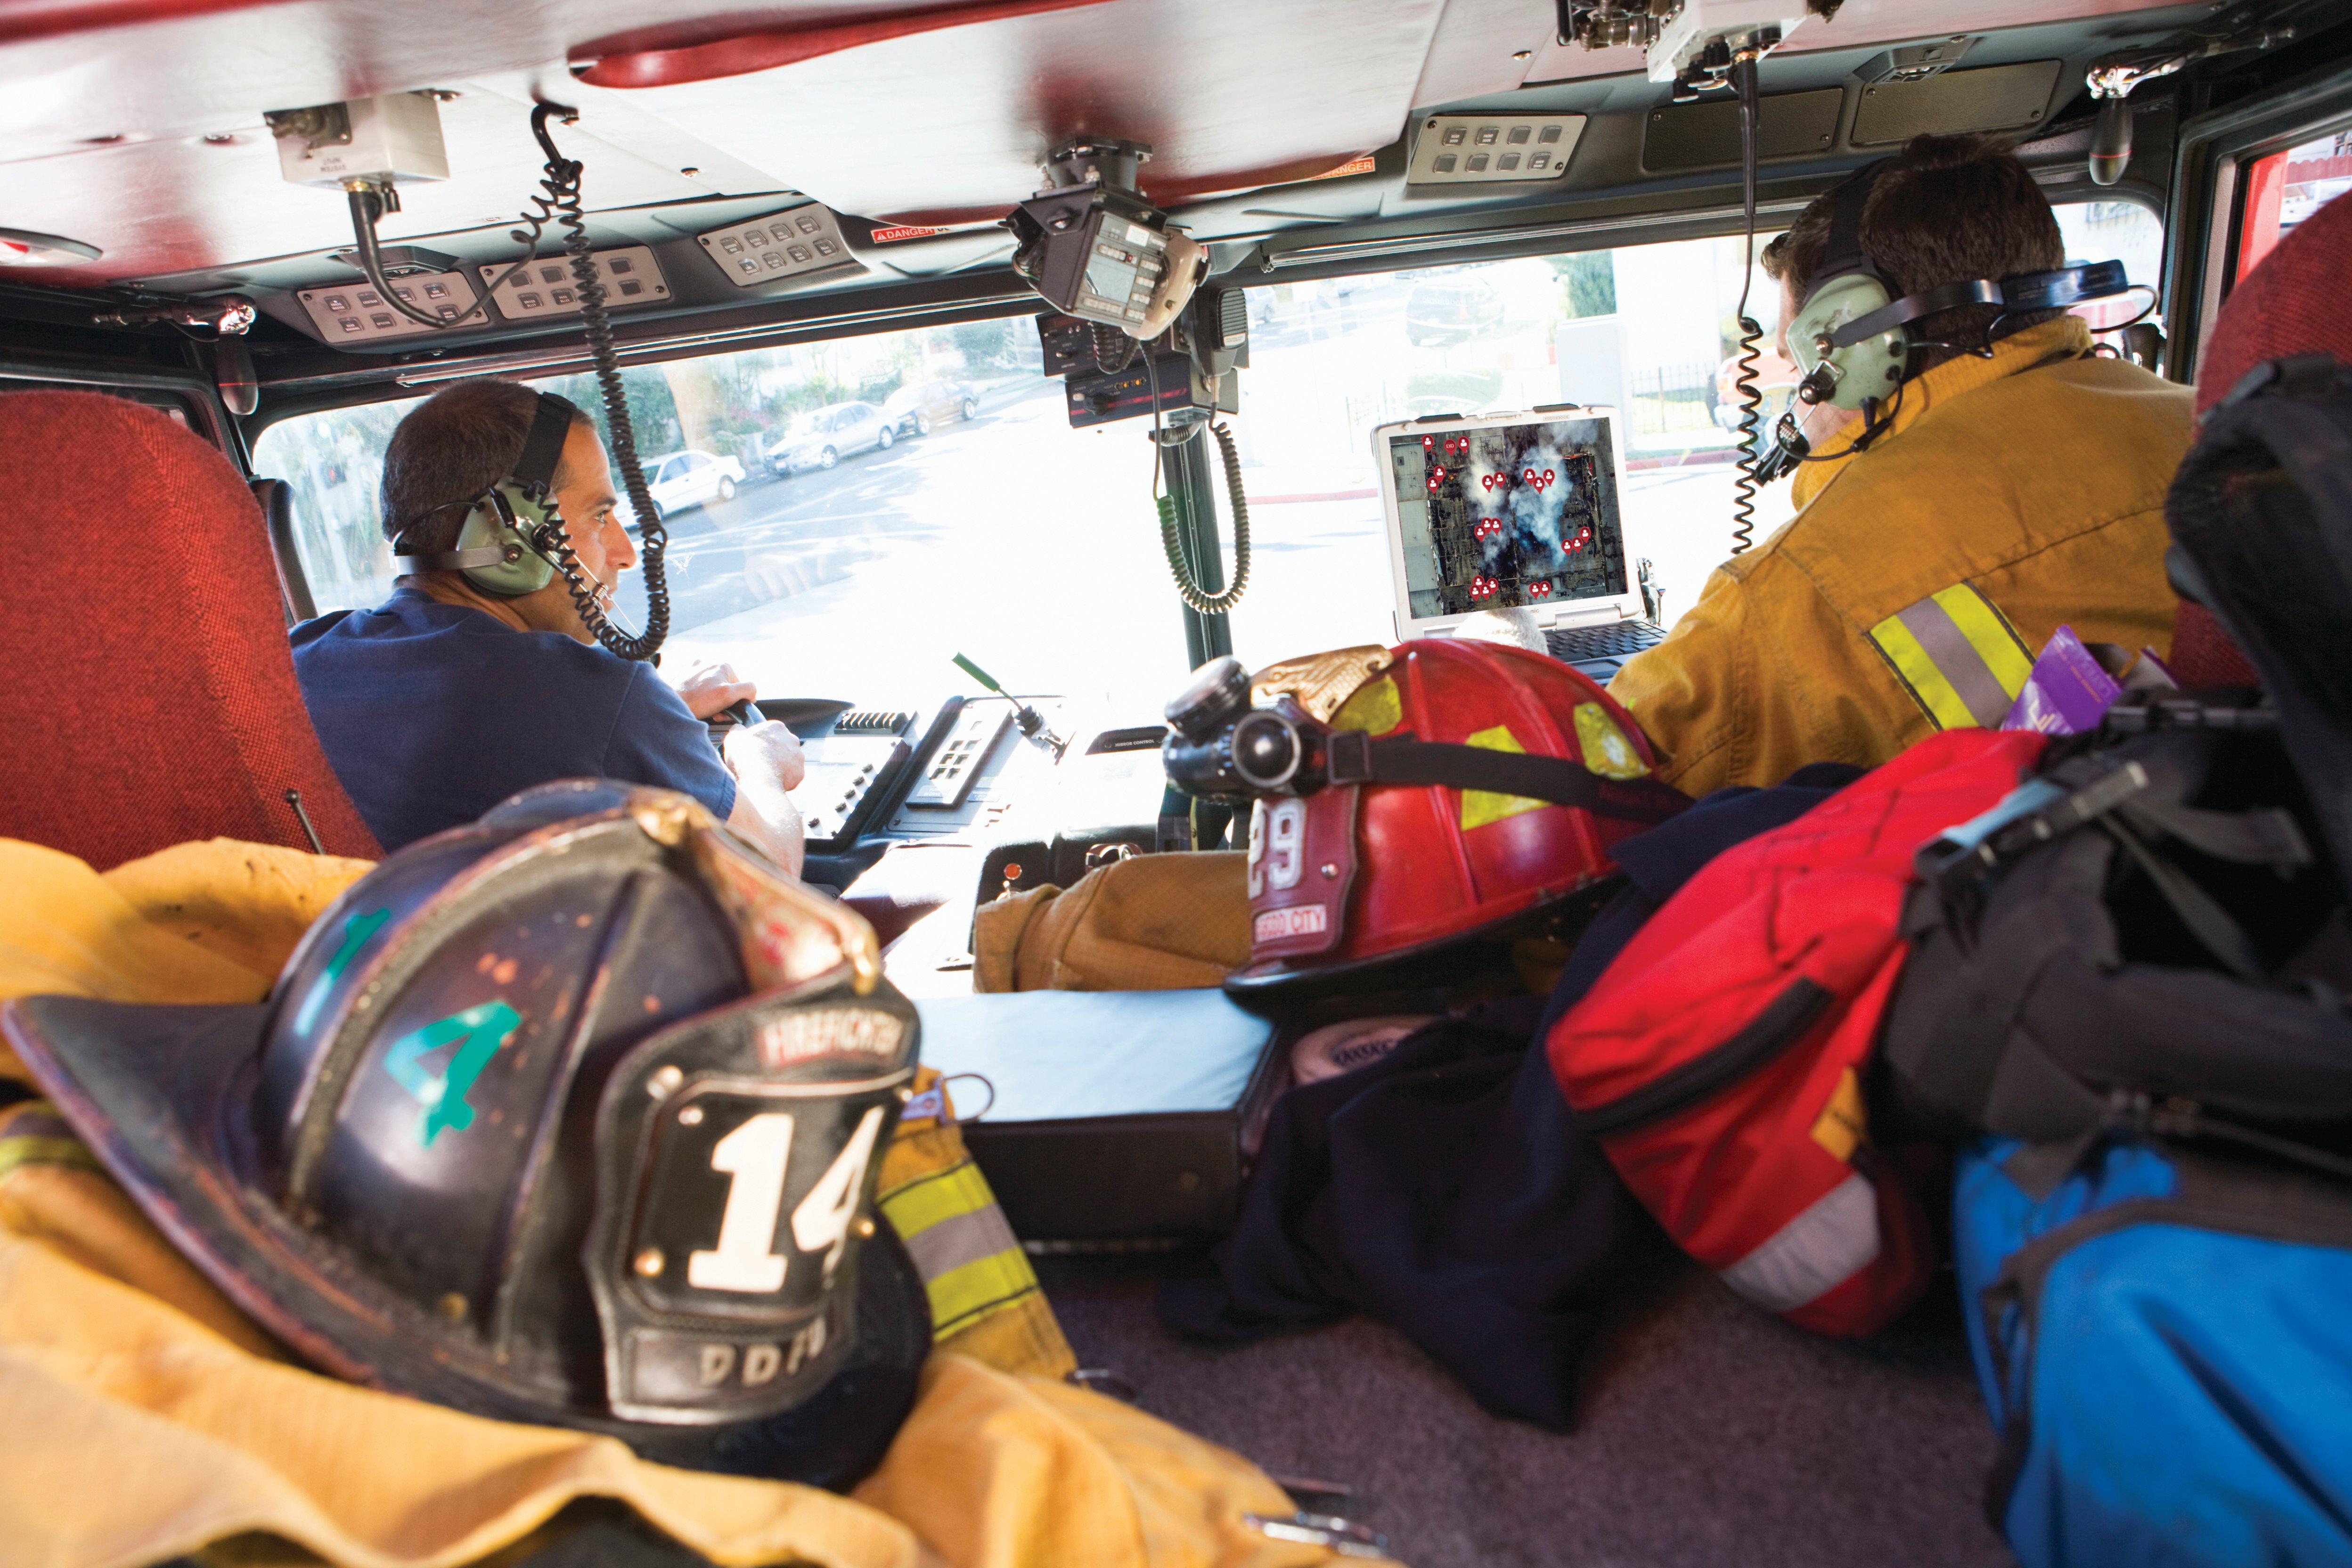 iStock-140217121_firefighters